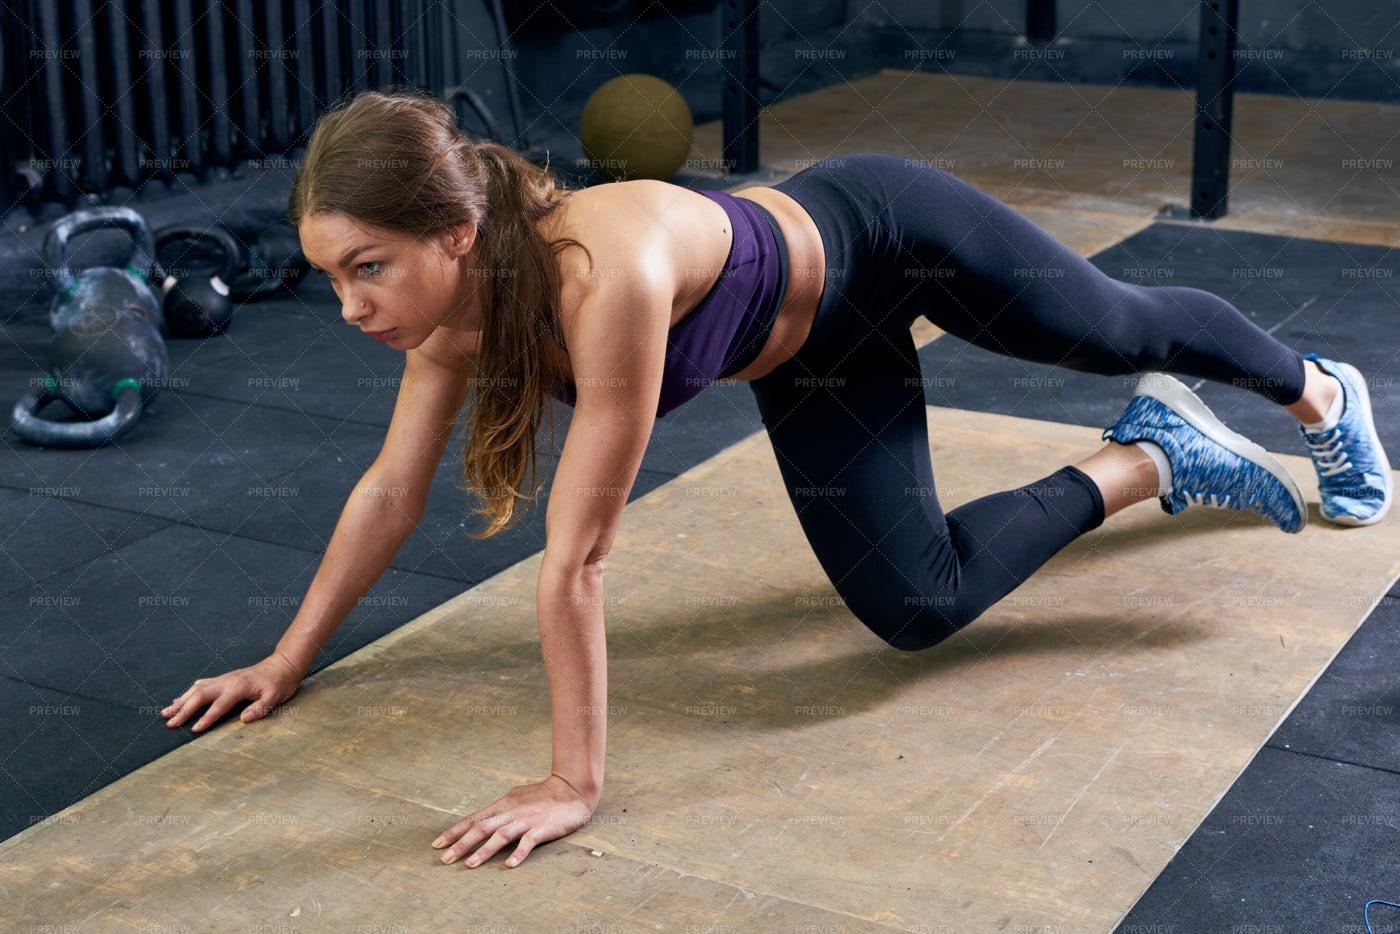 Beautiful Young Woman Exercising In...: Stock Photos